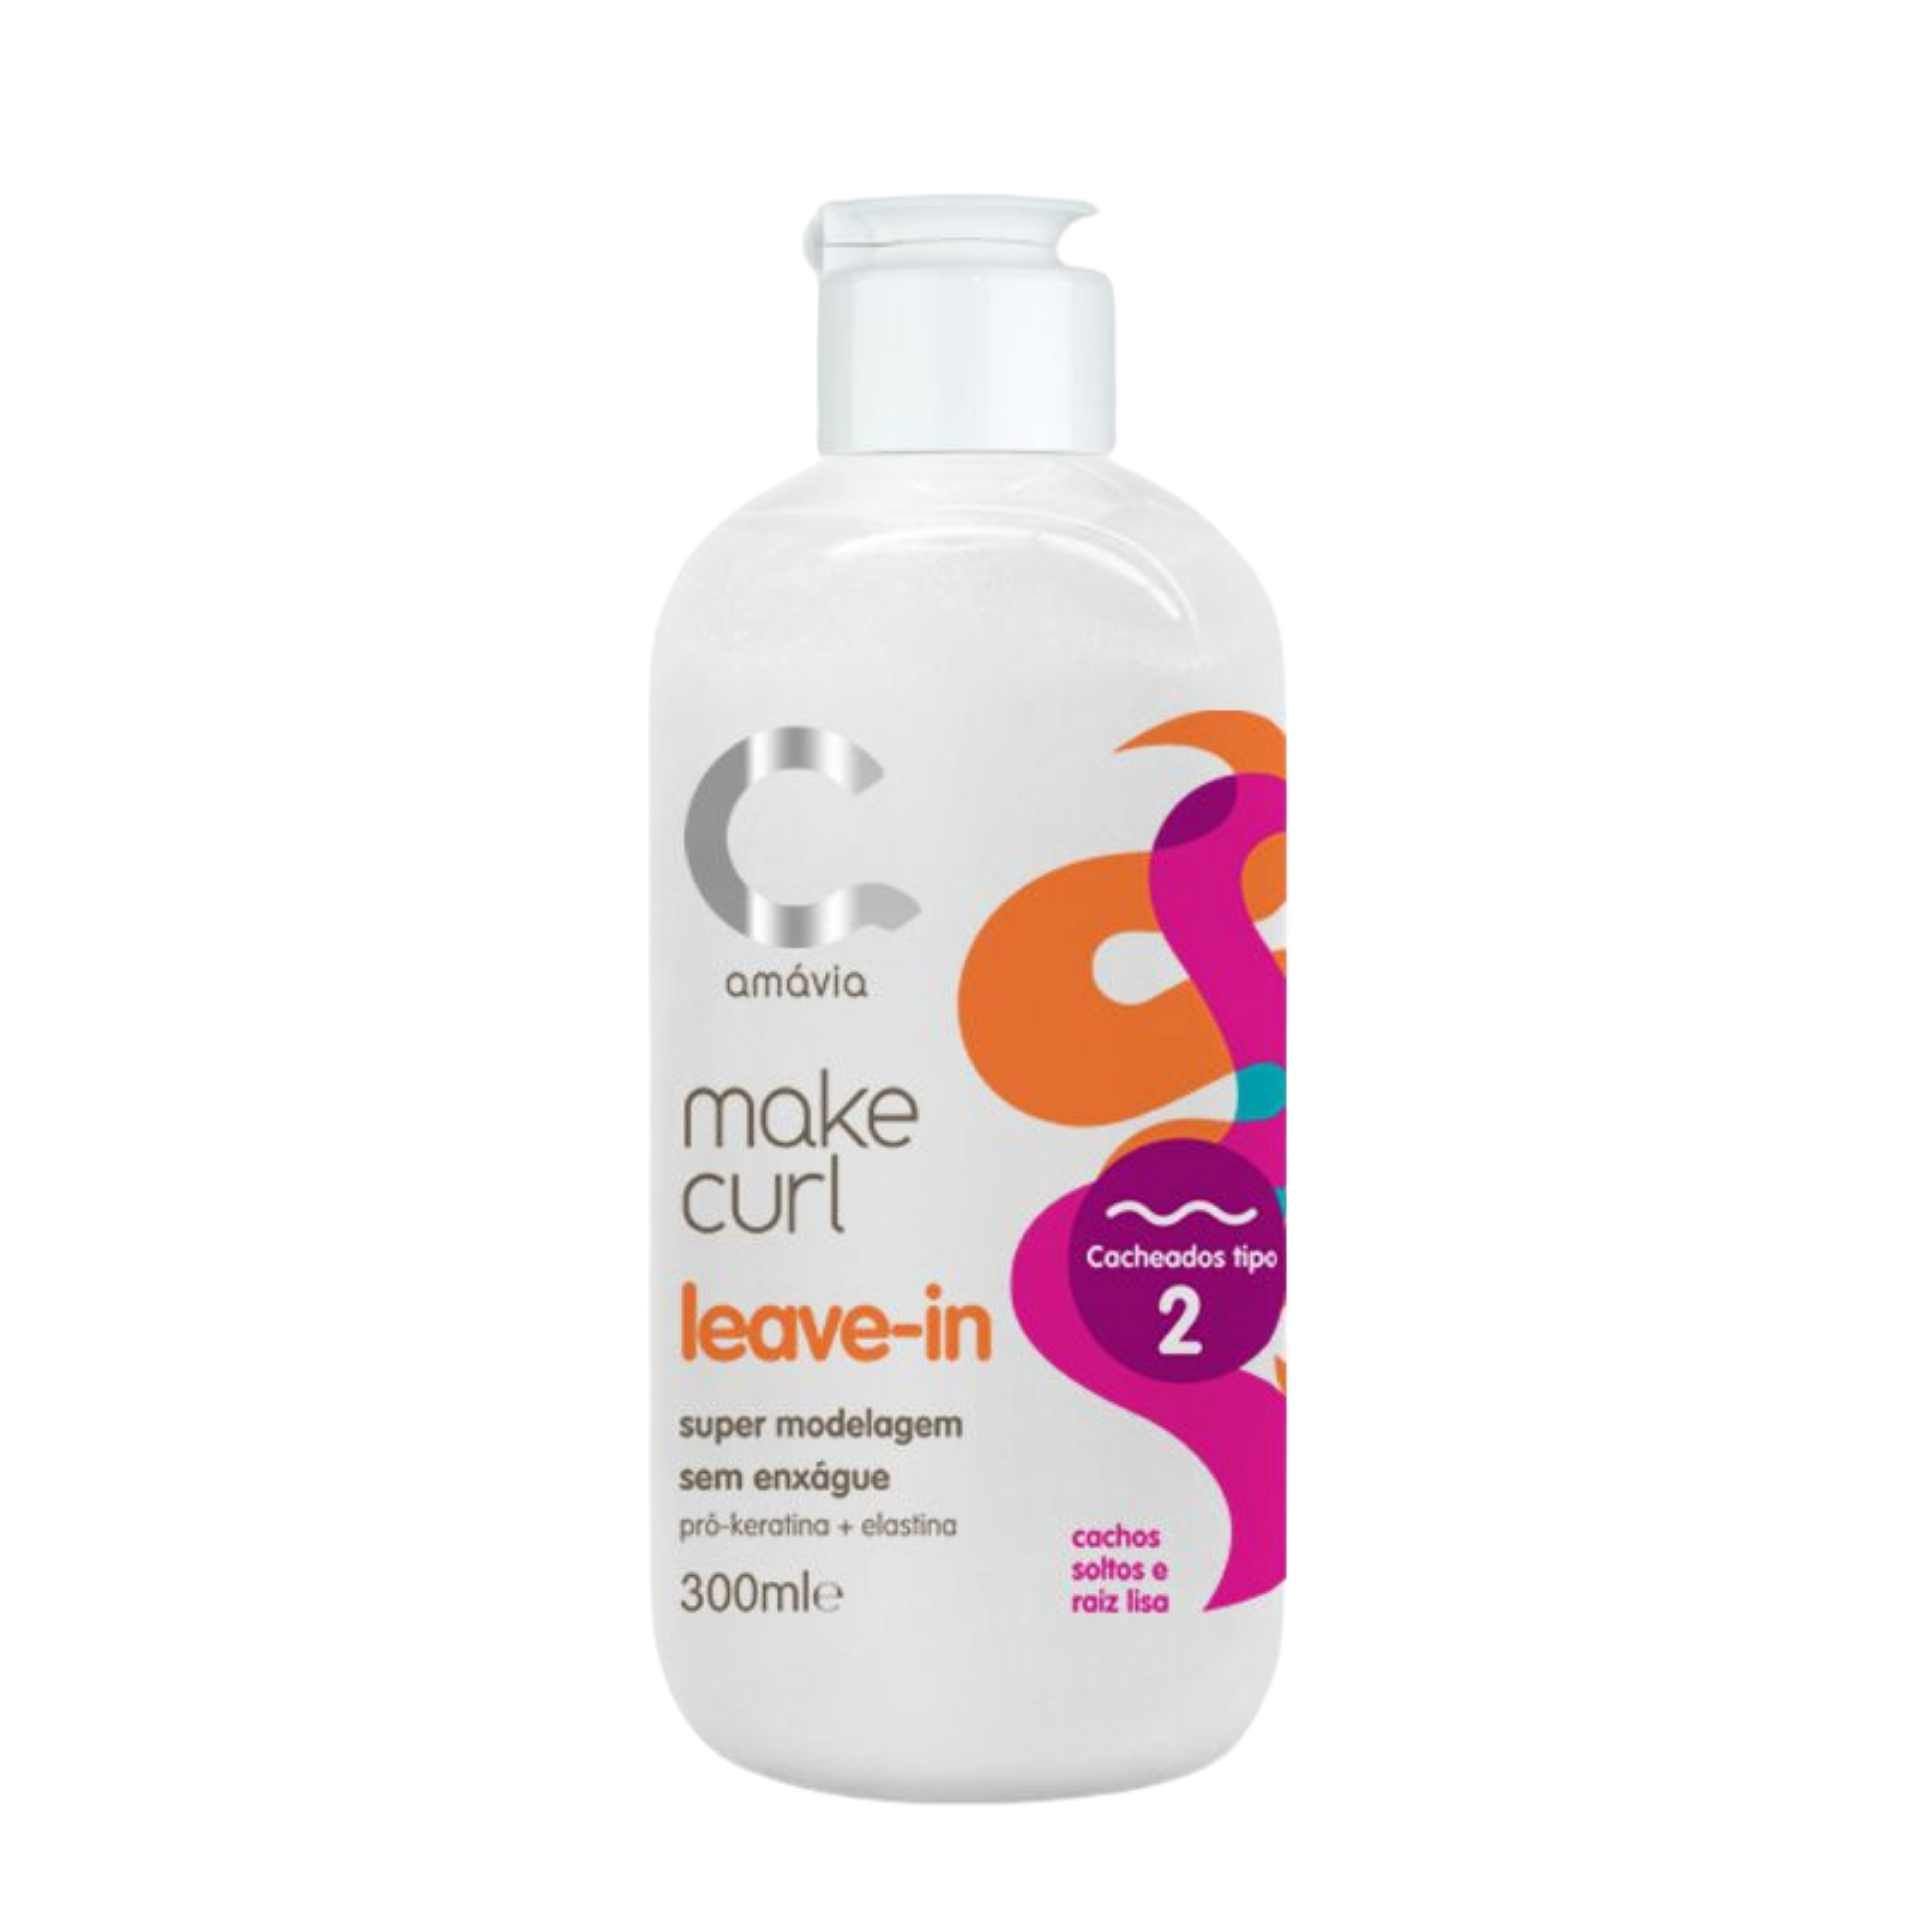 Amávia - Make Curl Leave-in Cacho Tipo 2 - 300ml